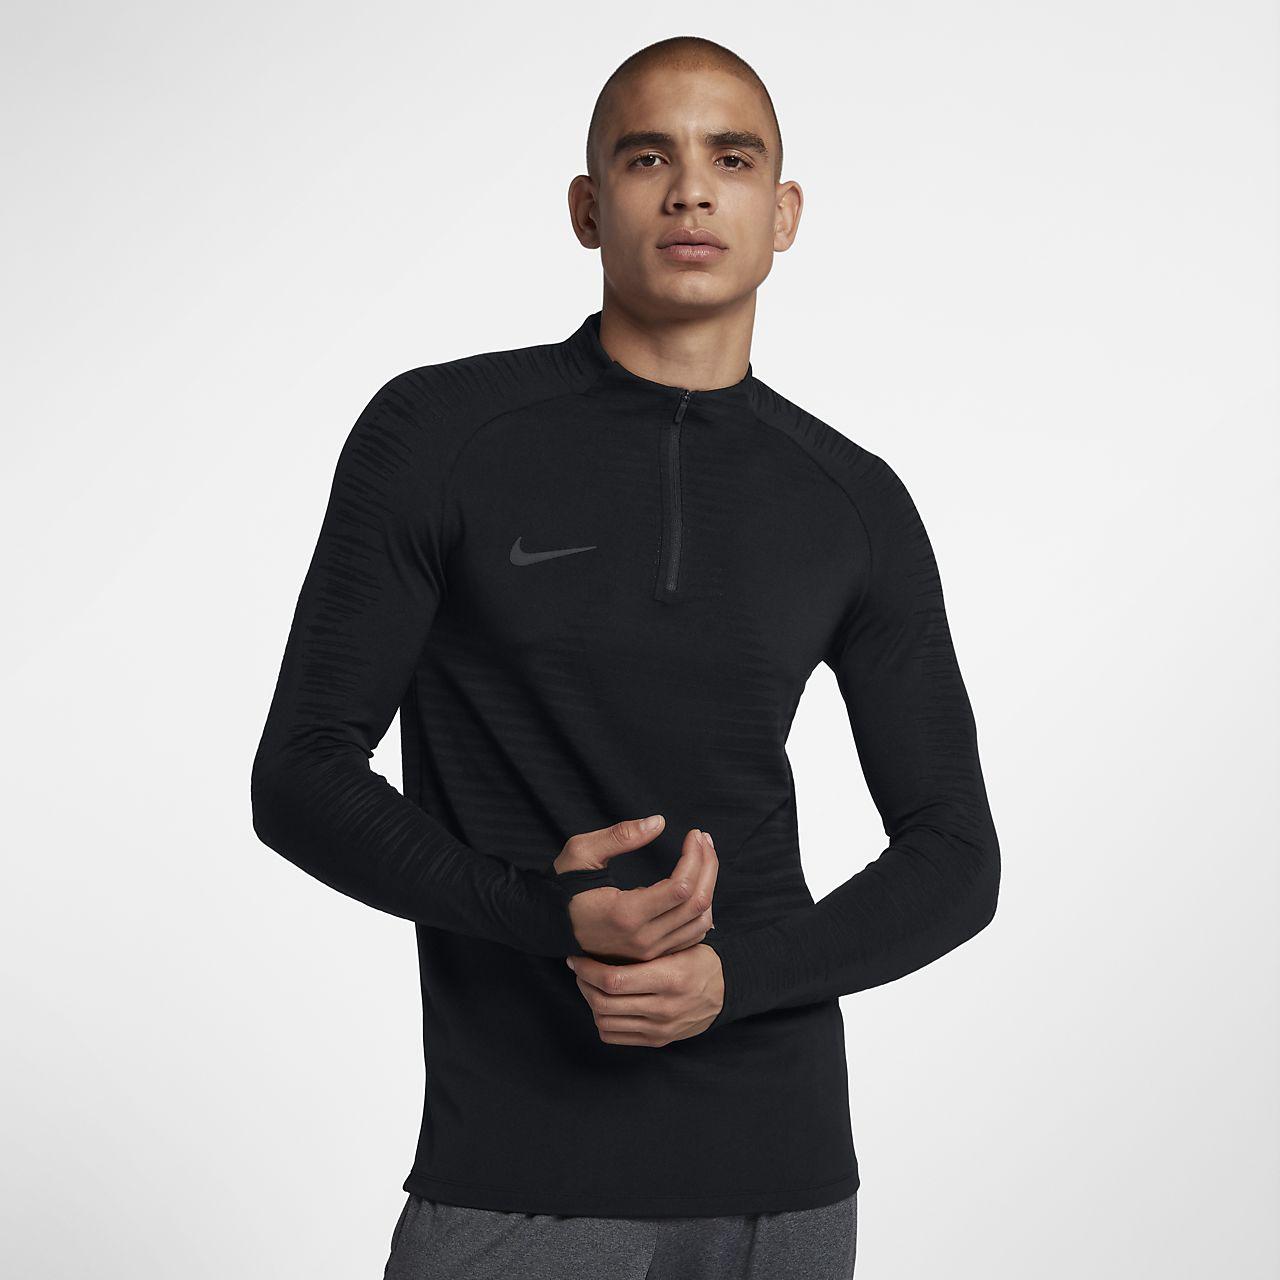 Maglia da calcio a manica lunga Nike VaporKnit Strike - Uomo